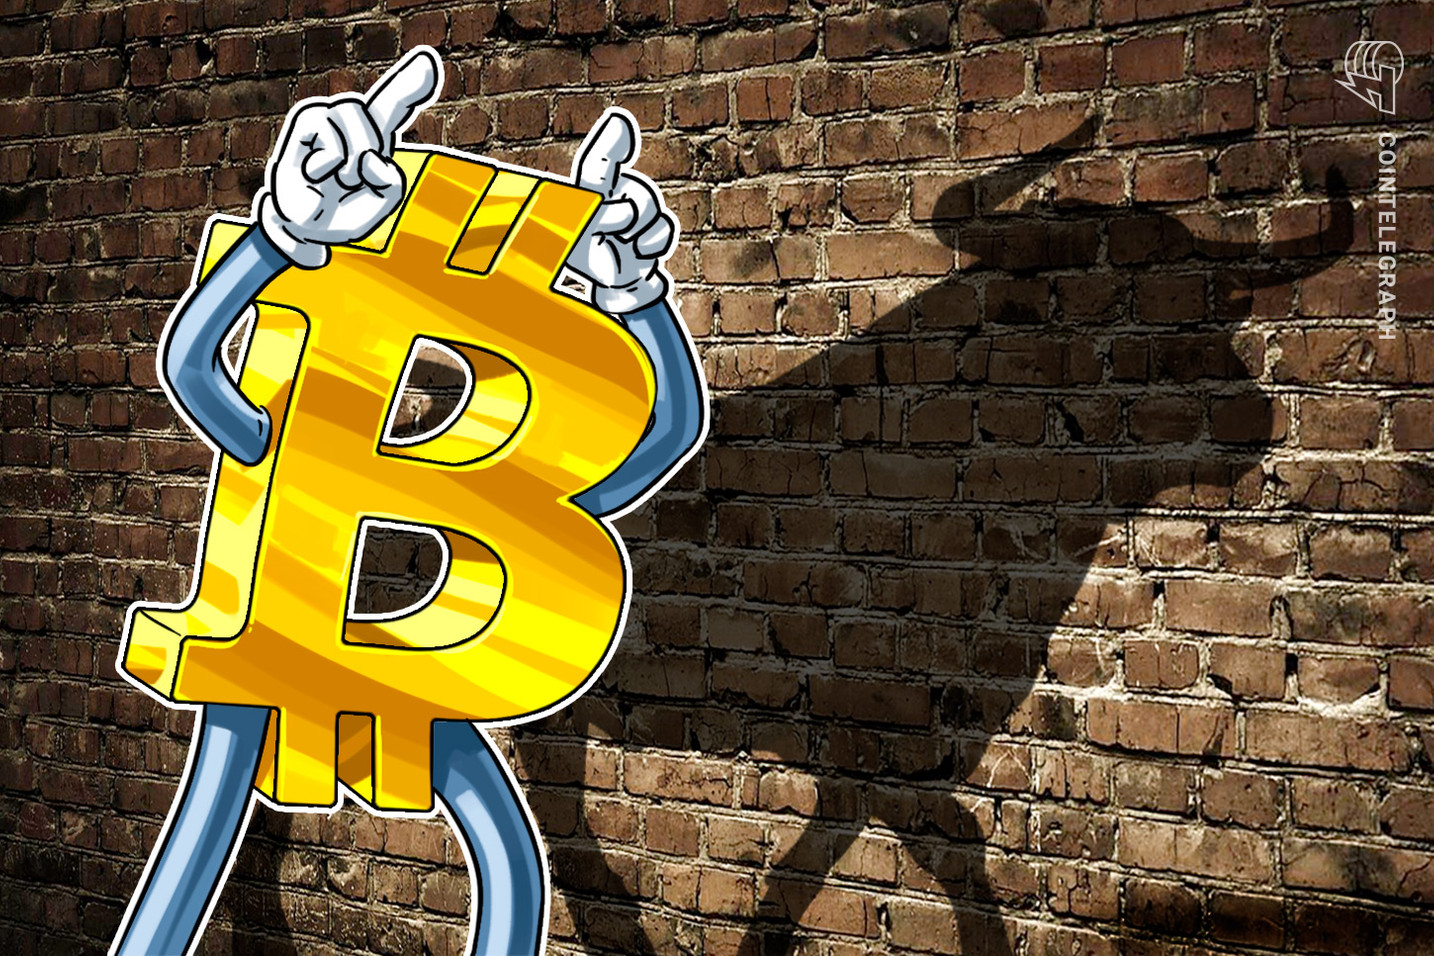 3 Bitcoin price indicators prove pro traders are still bullish on BTC